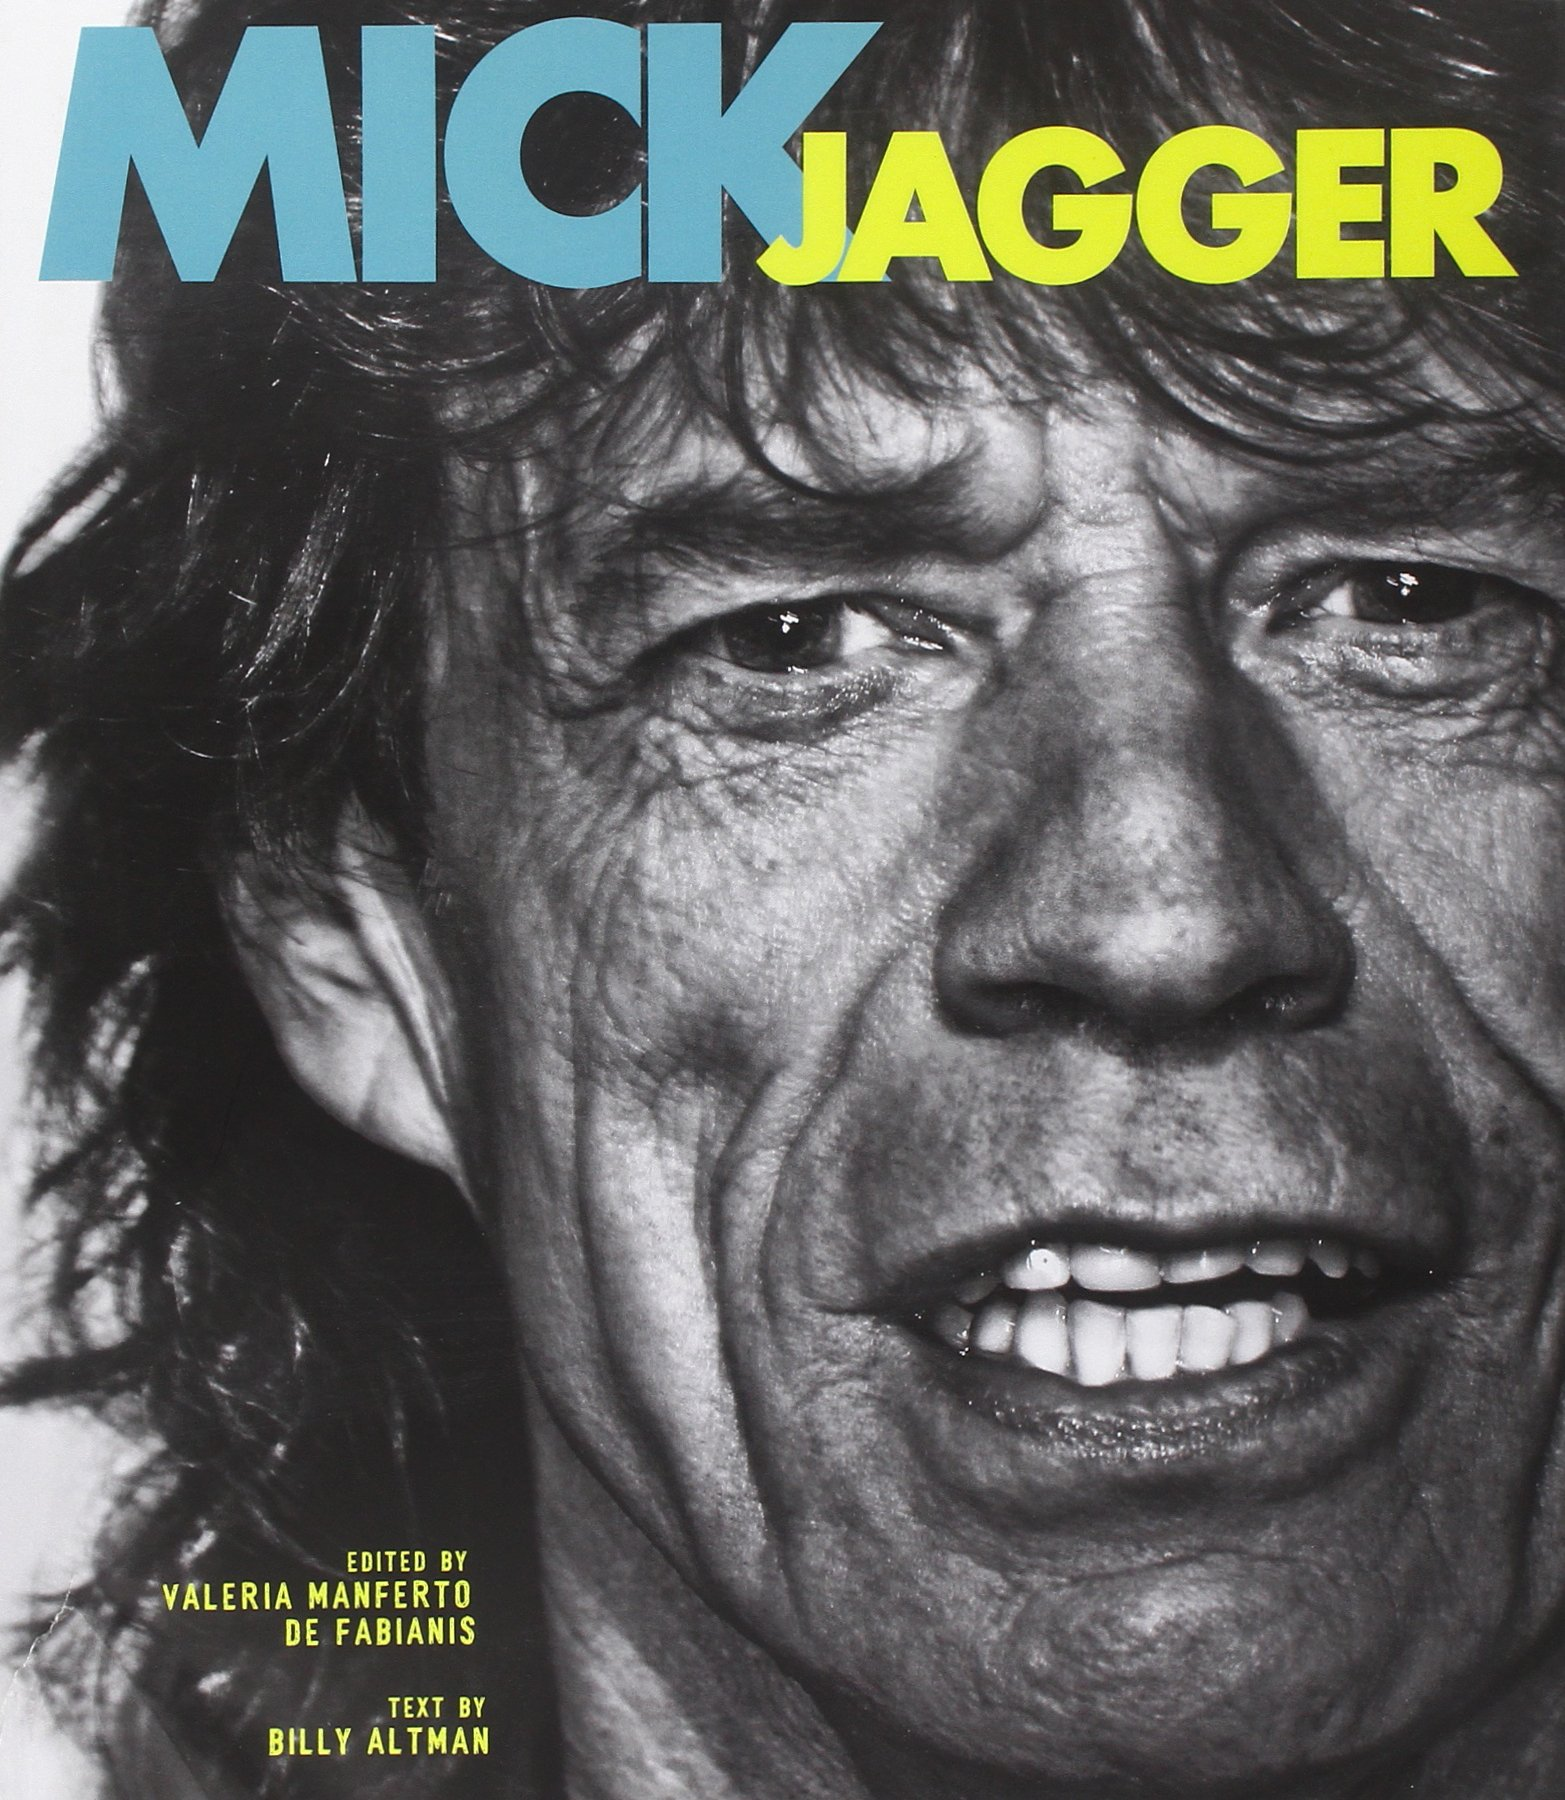 Mick Jagger: Billy J. Altman, Valeria Manferto De Fabianis ...